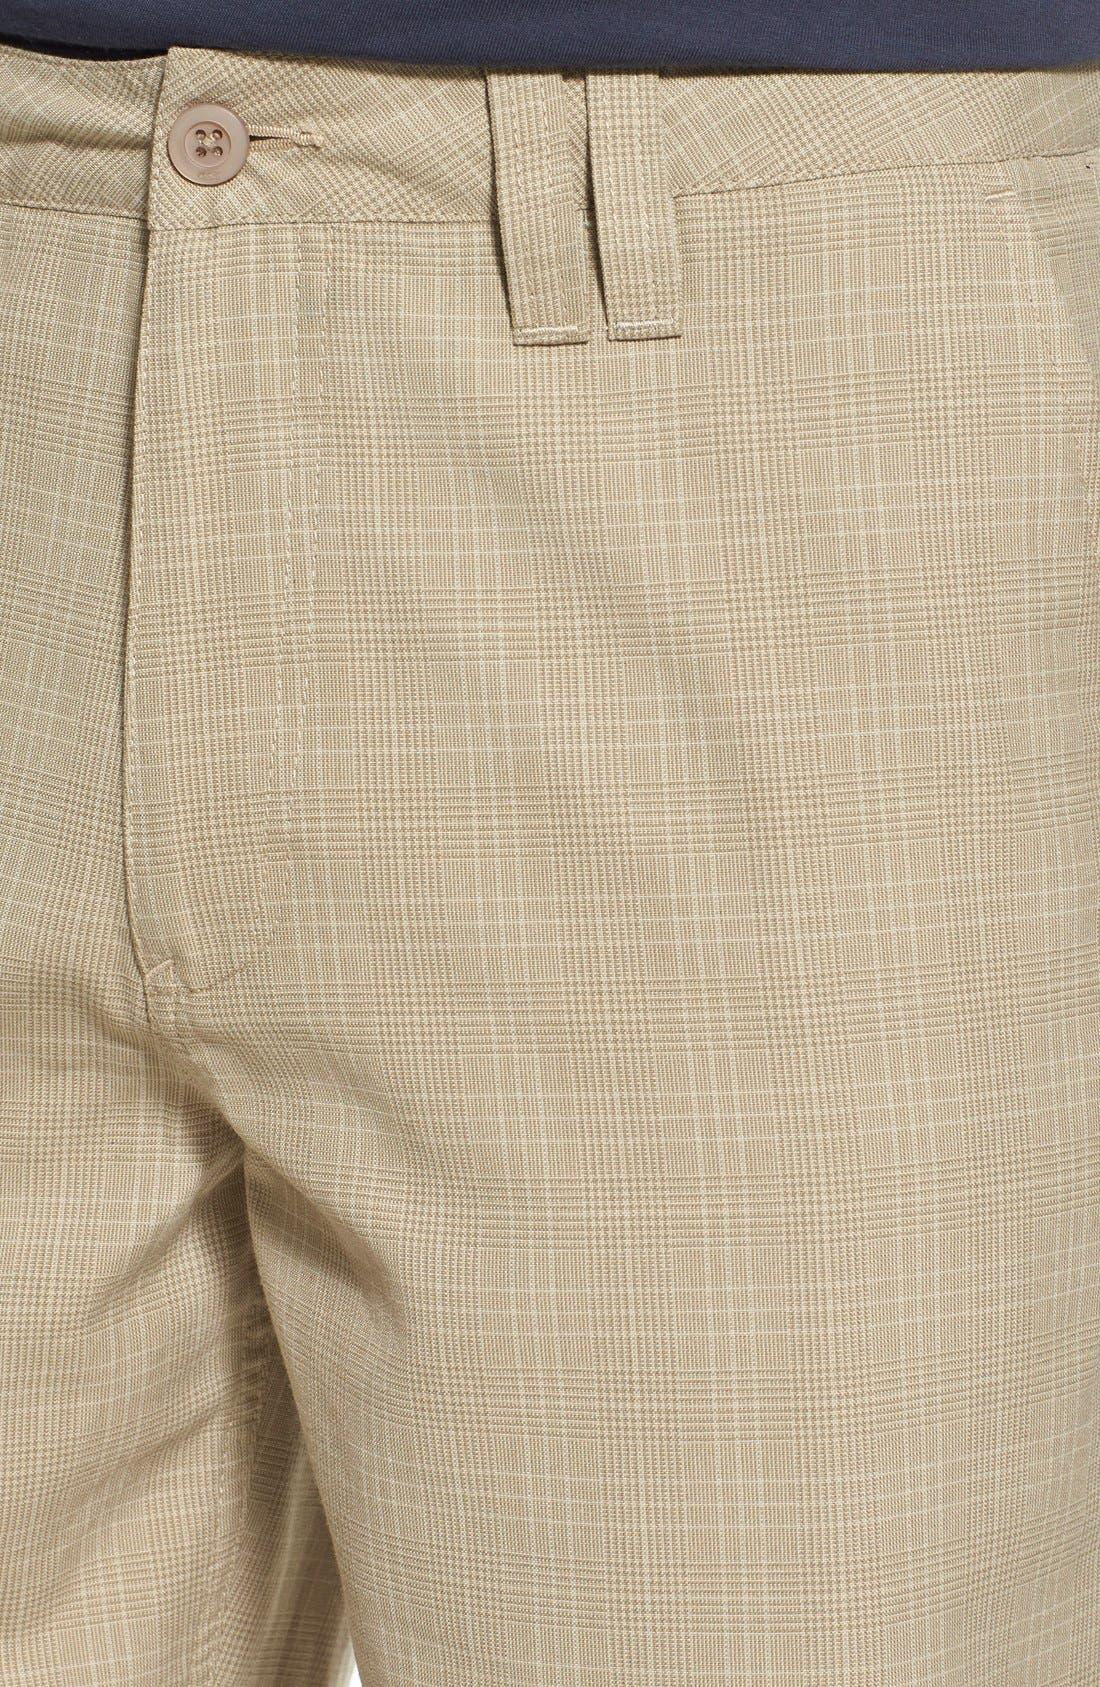 'Delta Plaid' Chino Shorts,                             Alternate thumbnail 25, color,